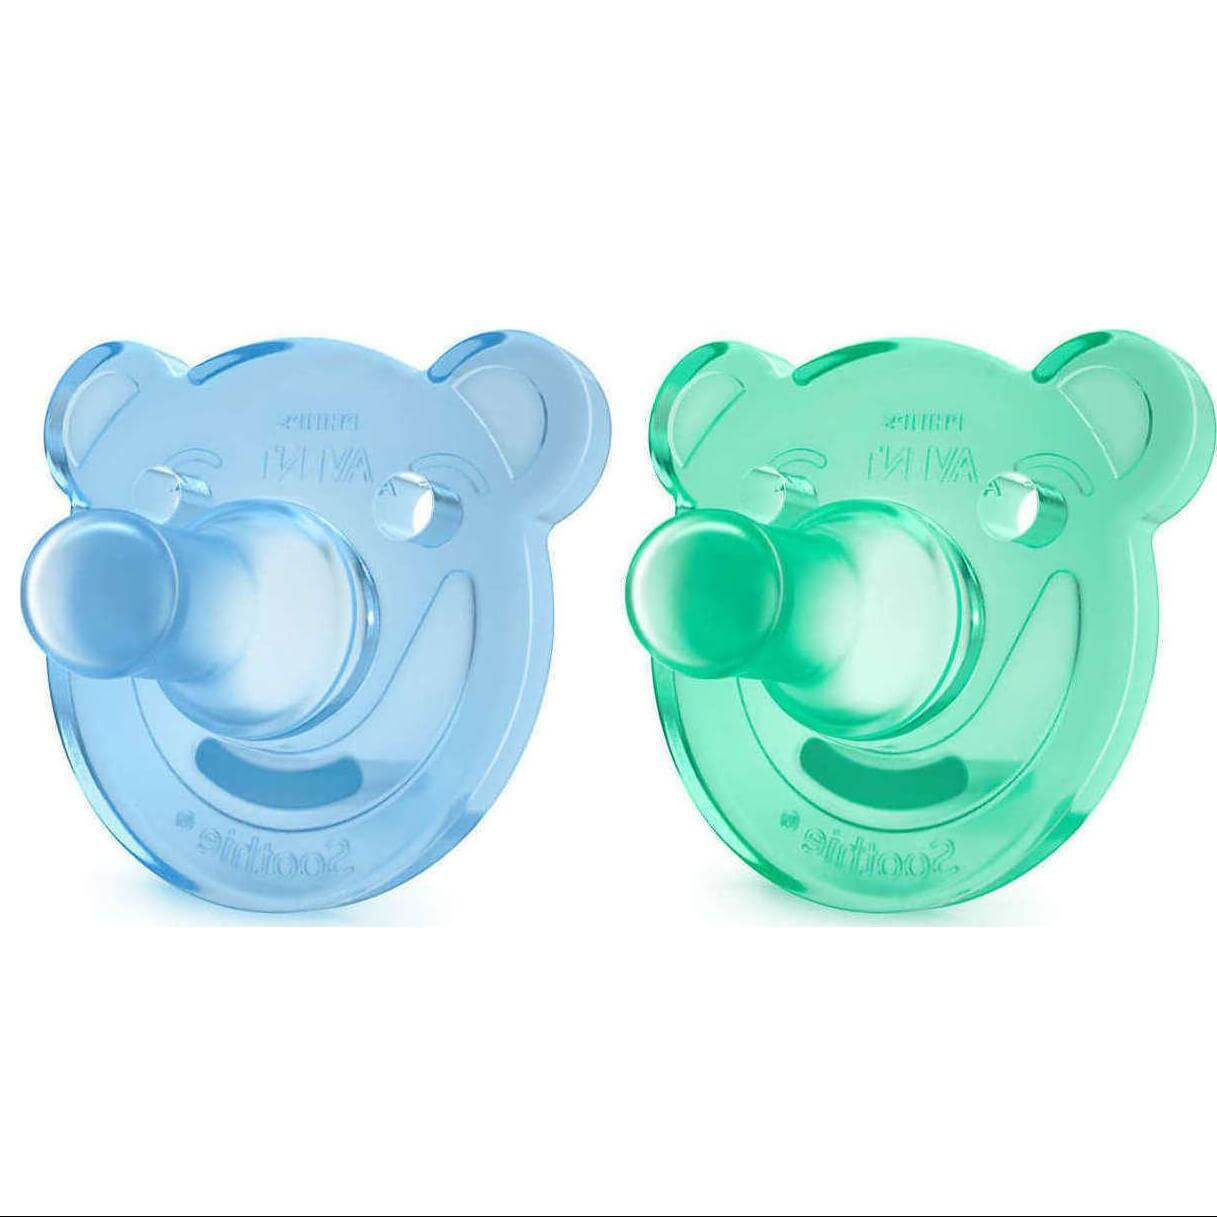 Avent Soothie Πιπίλα Σιλικόνης 0-3m, Μπλε – Πράσινο, 2 τεμάχια SCF194/01